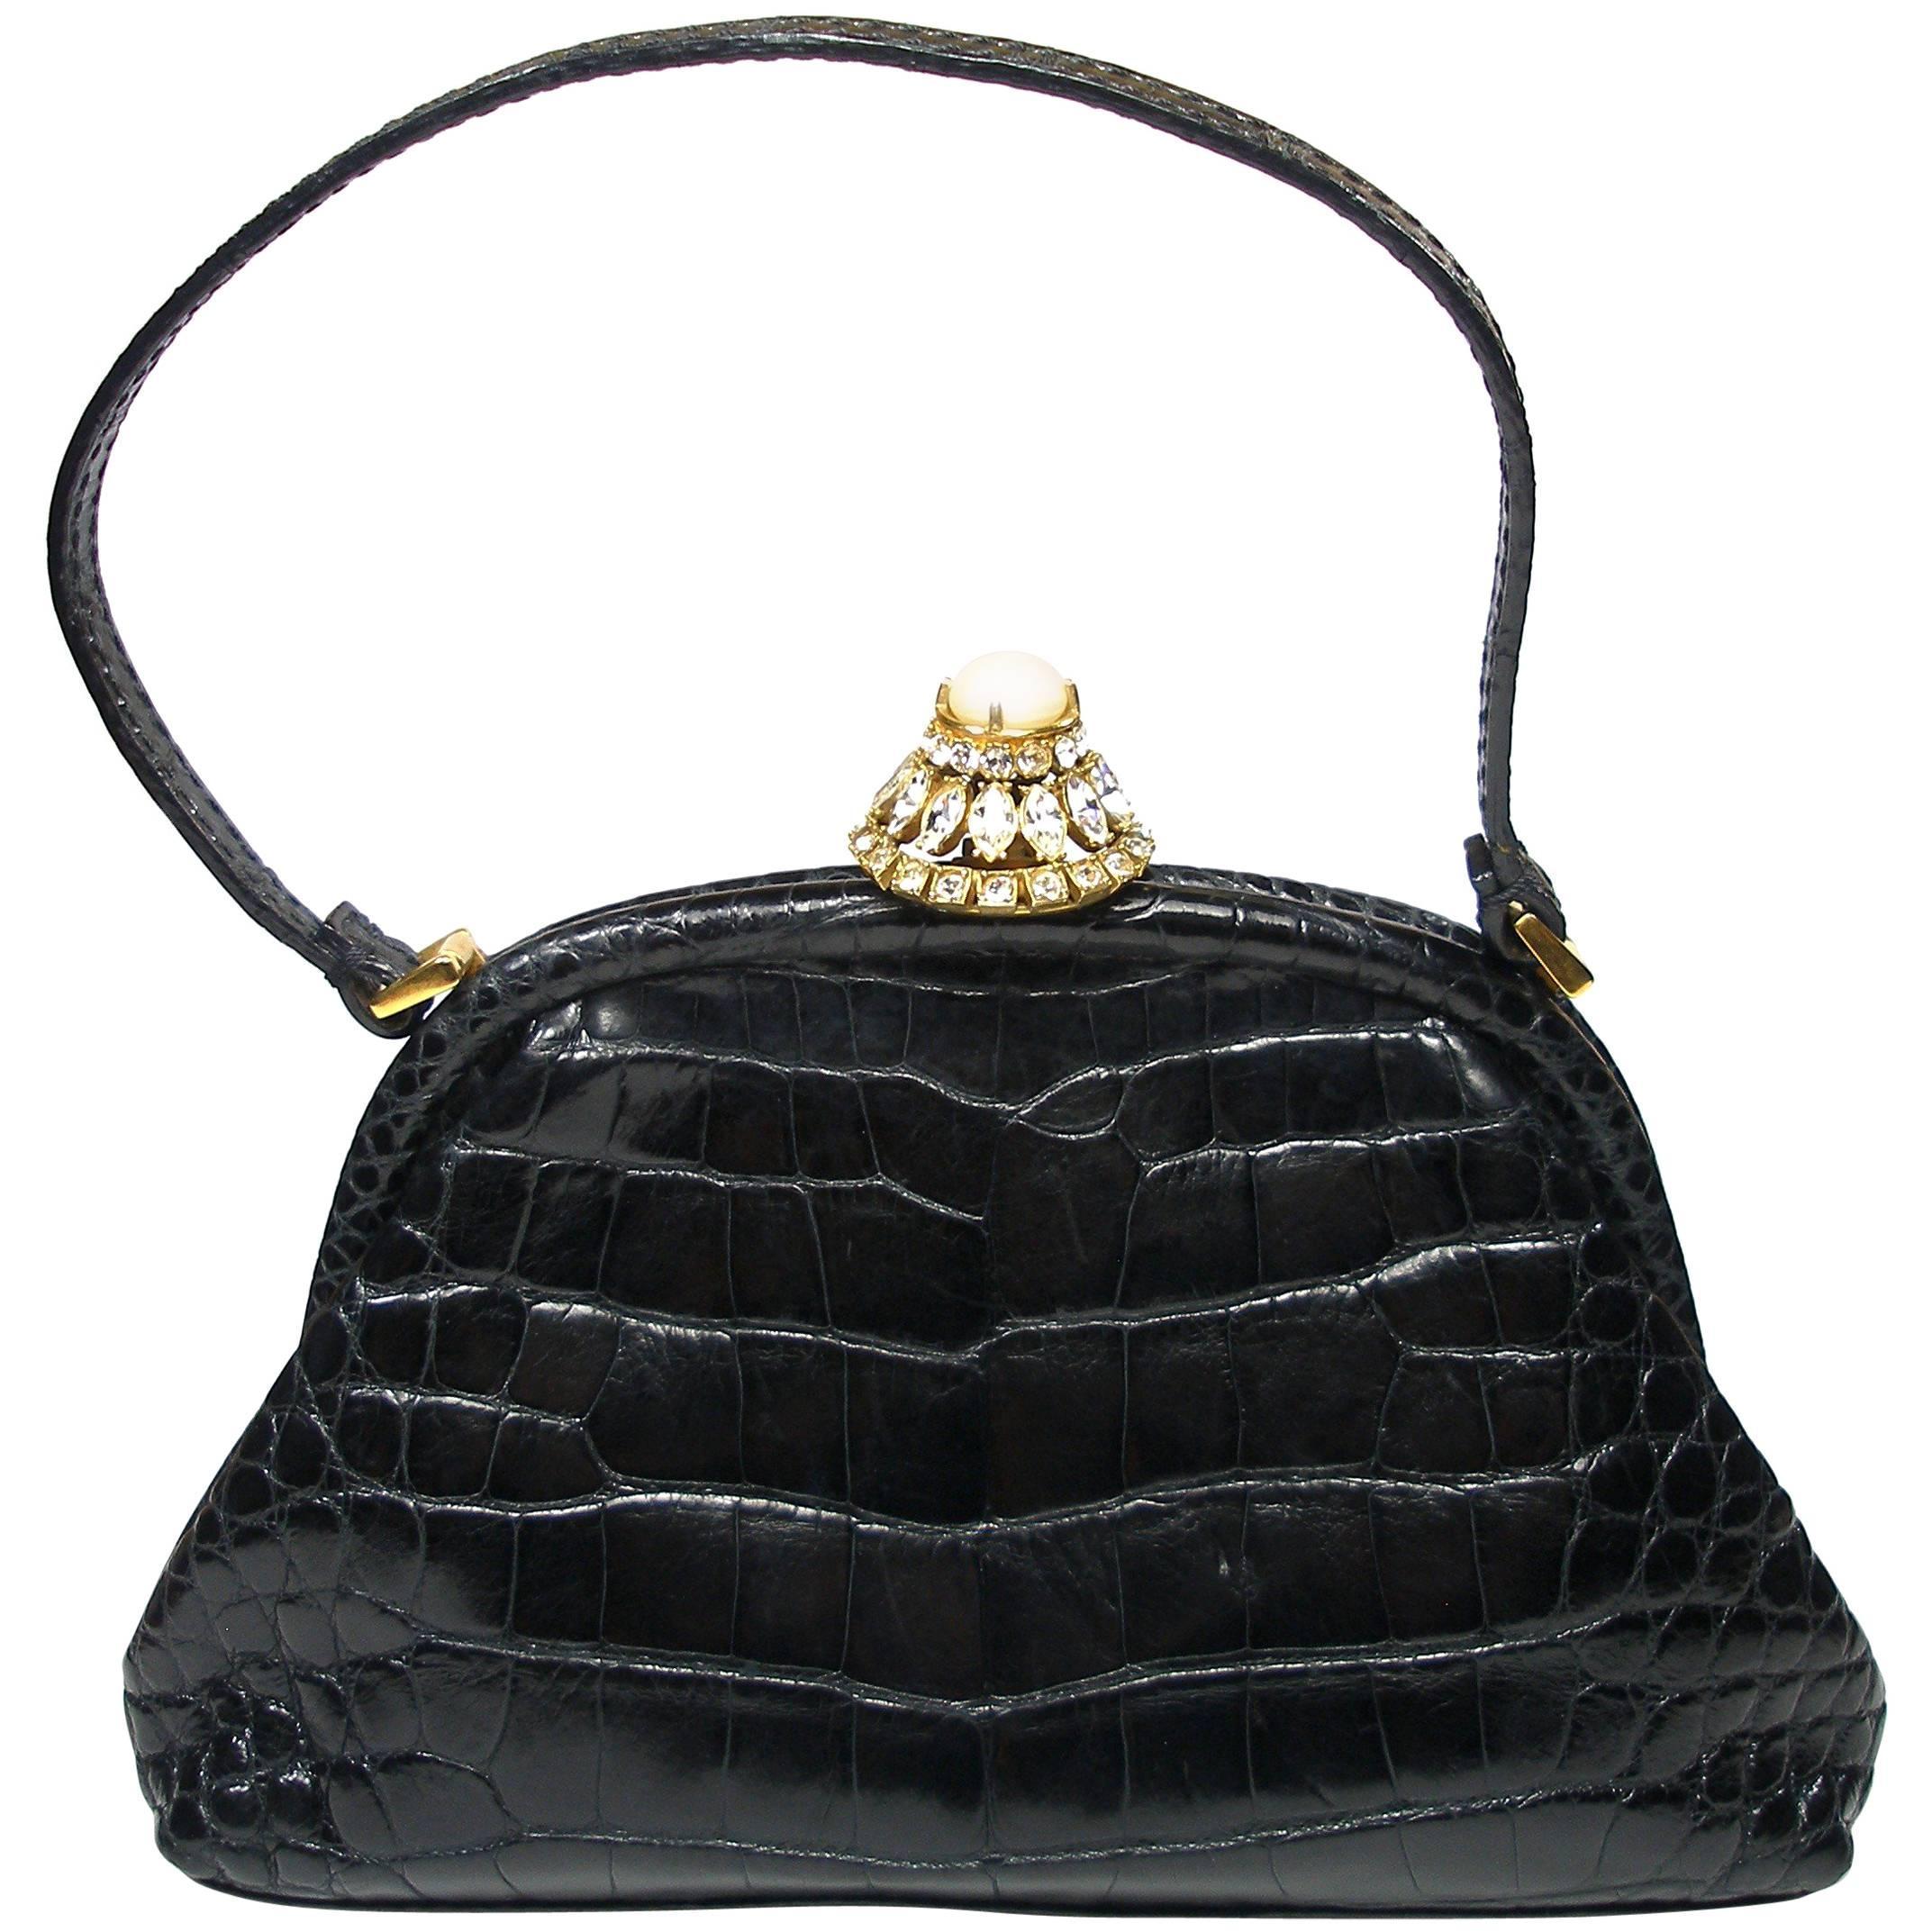 Valentino Rare Alligator And Swarovski Crystals Valentino Garavani Small Evening Handbag NGfC4